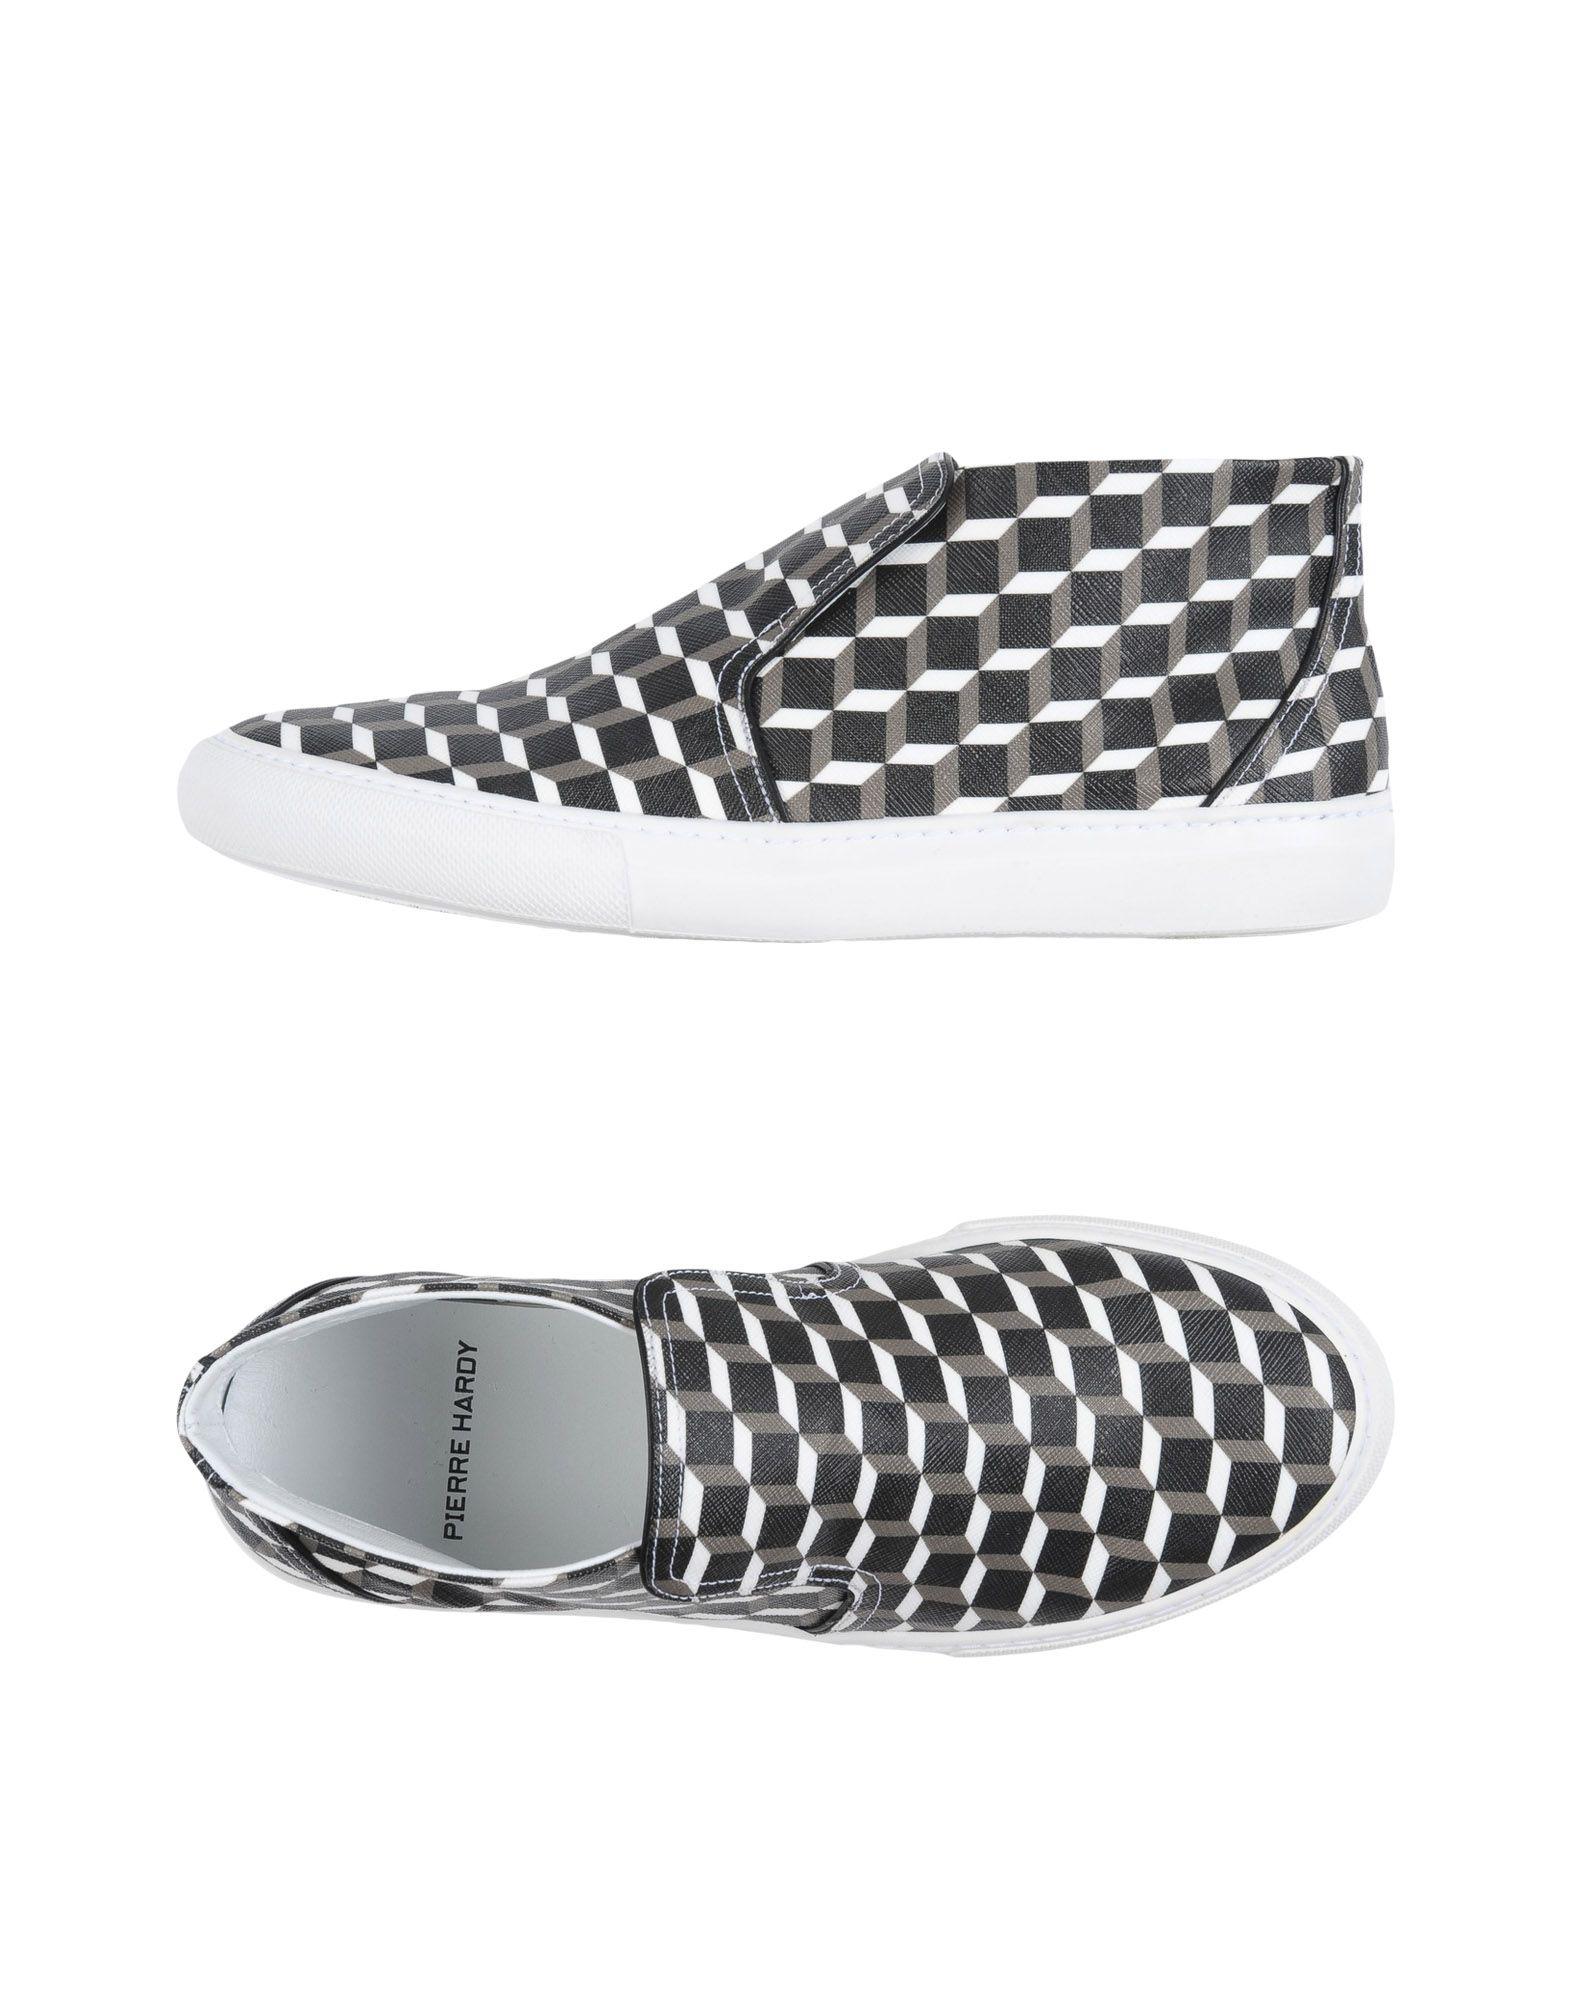 Pierre Hardy Sneakers Herren  11249104KR Gute Qualität beliebte Schuhe